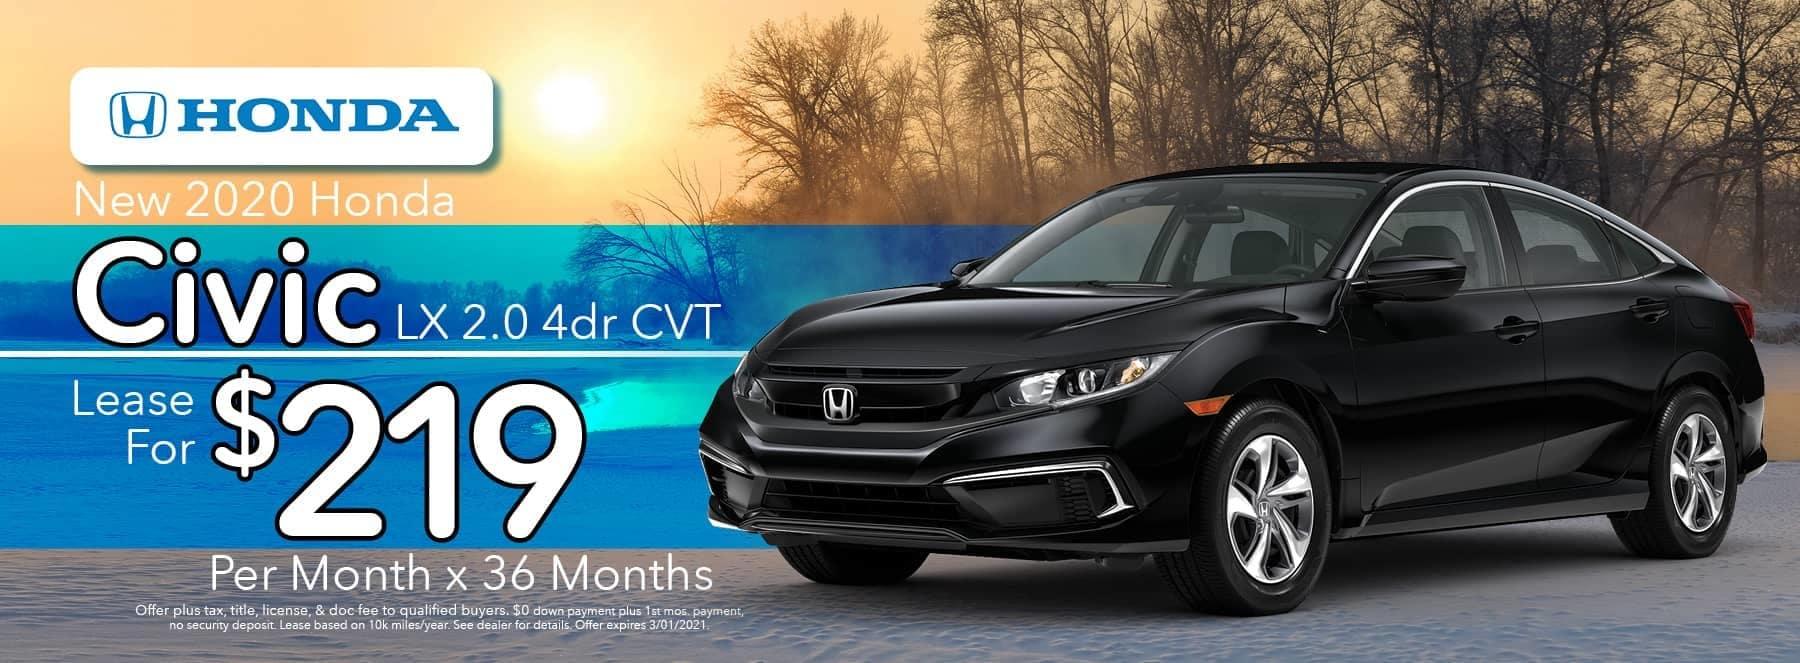 Vans Honda Specials - 2020 Civic - Lease for $219 per month-36months